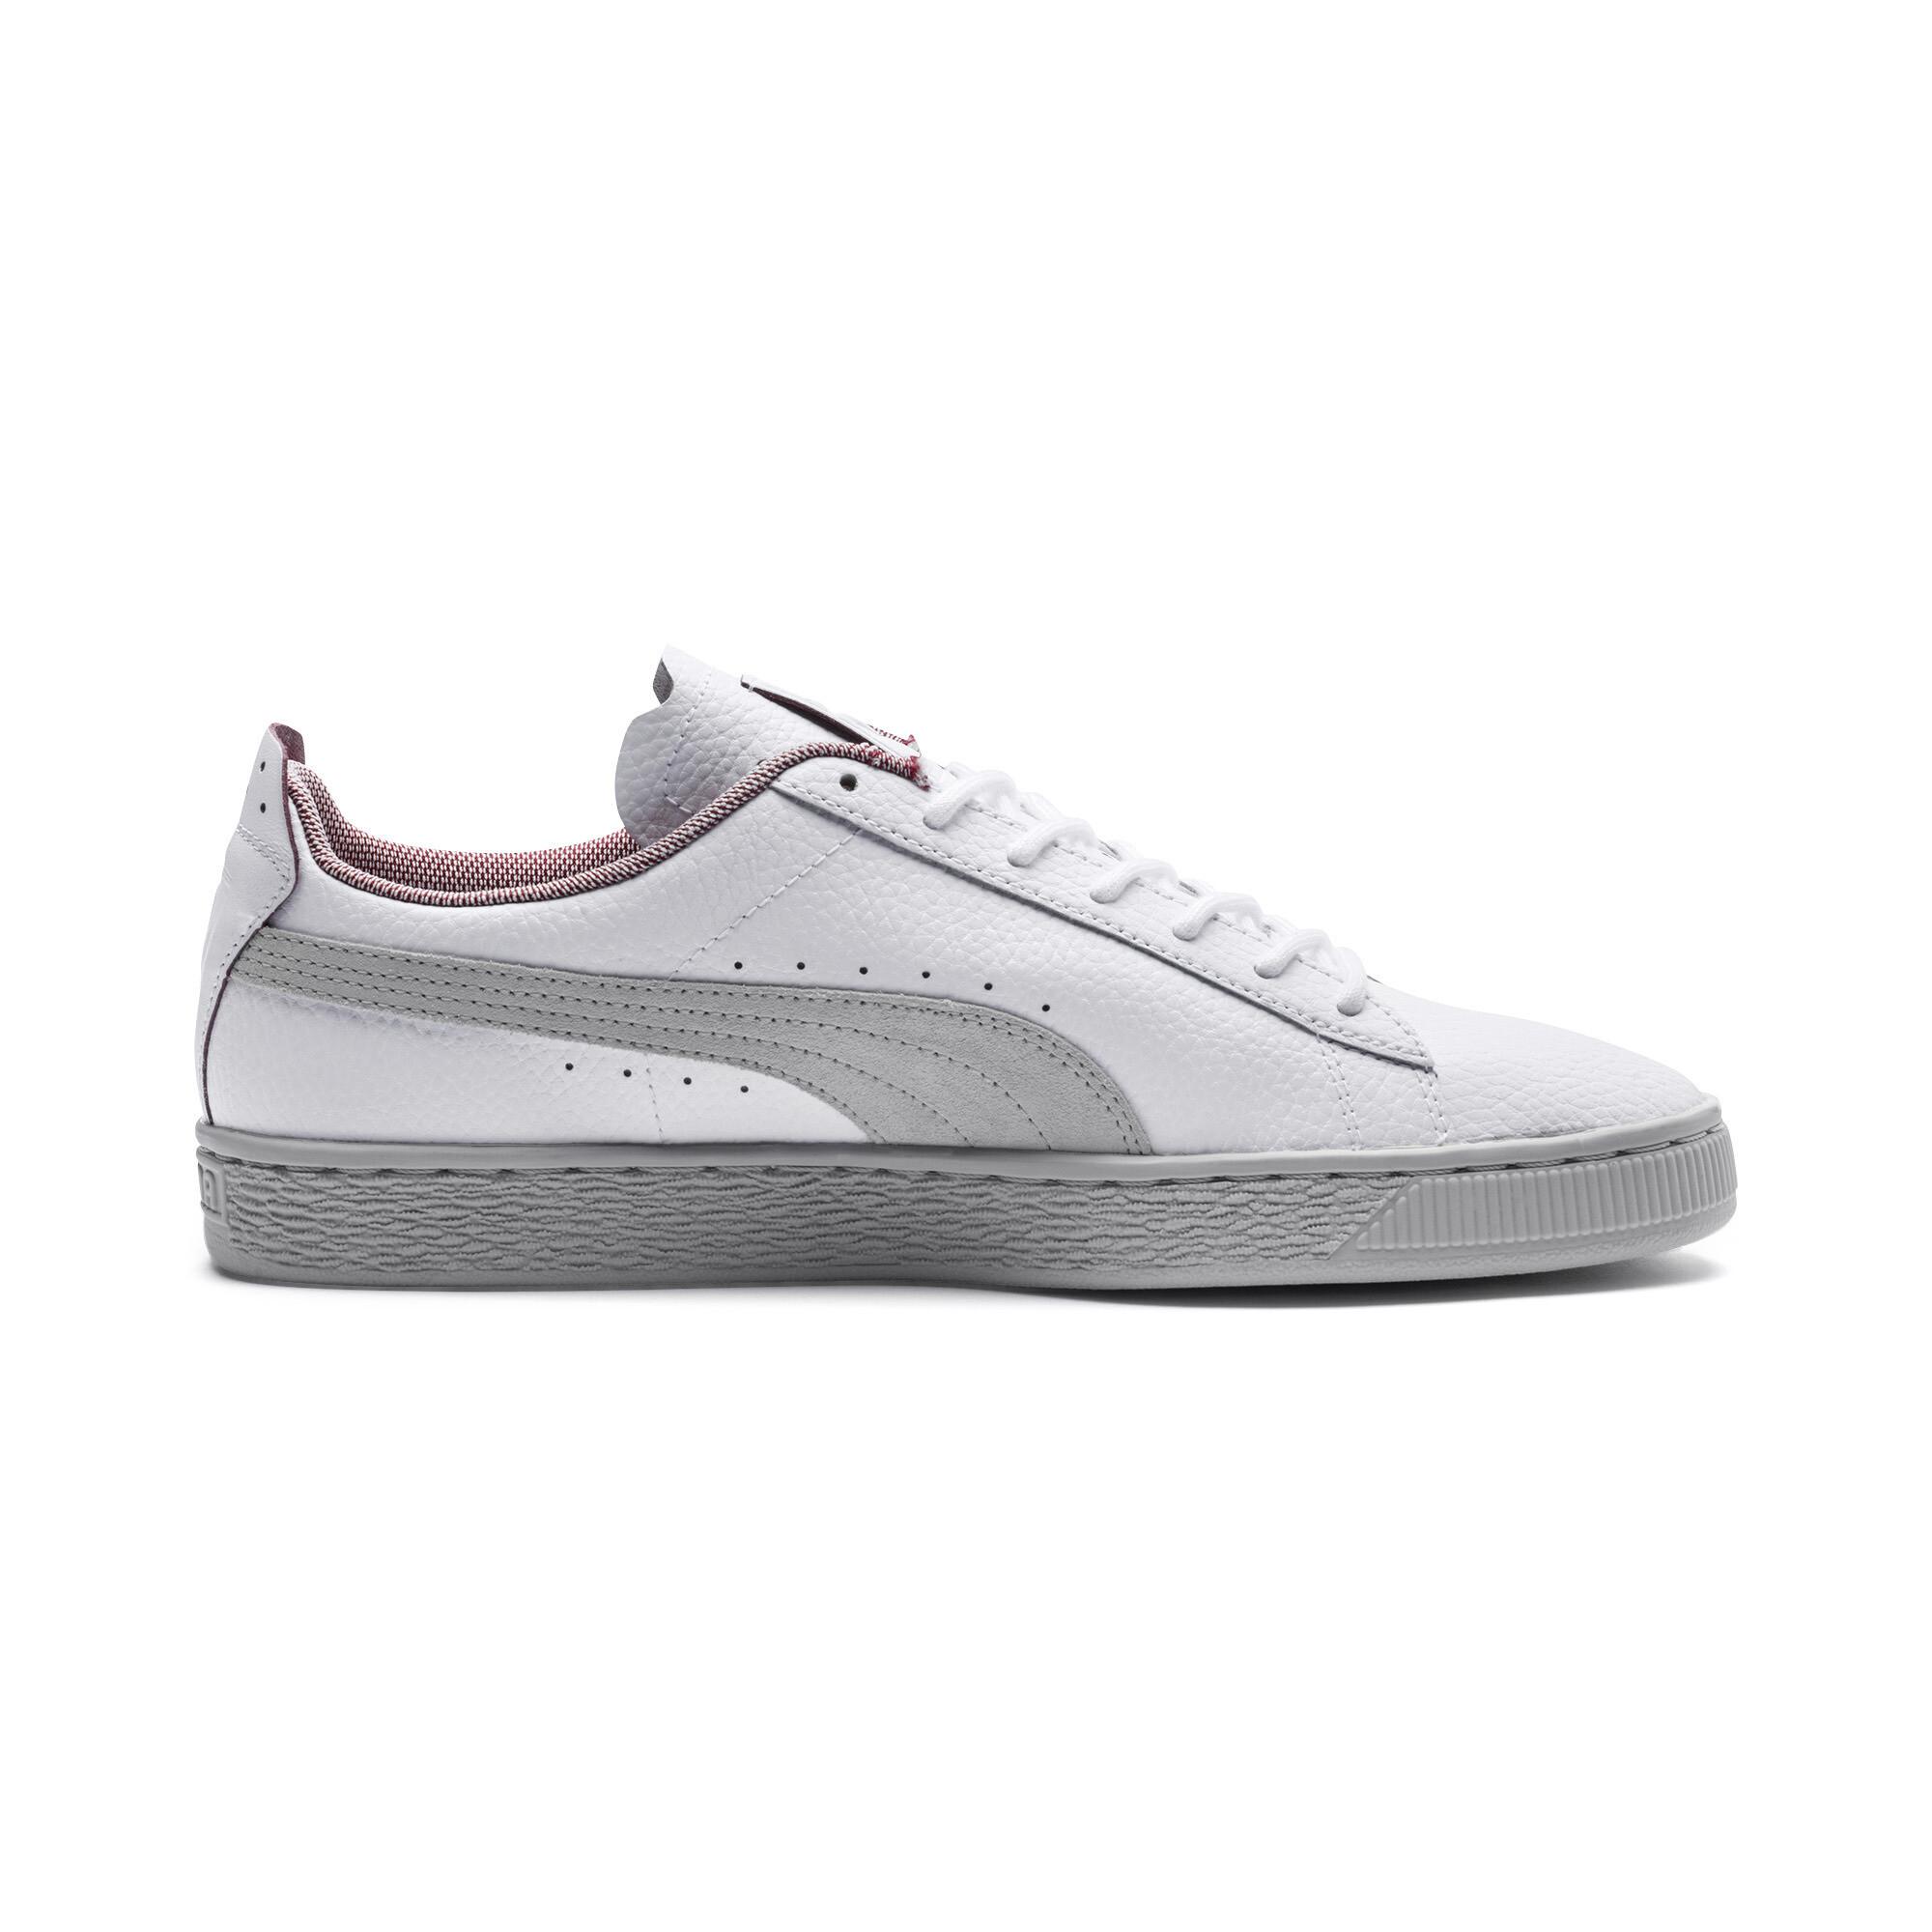 Details about PUMA Scuderia Ferrari Basket Sneakers Men Shoe Auto